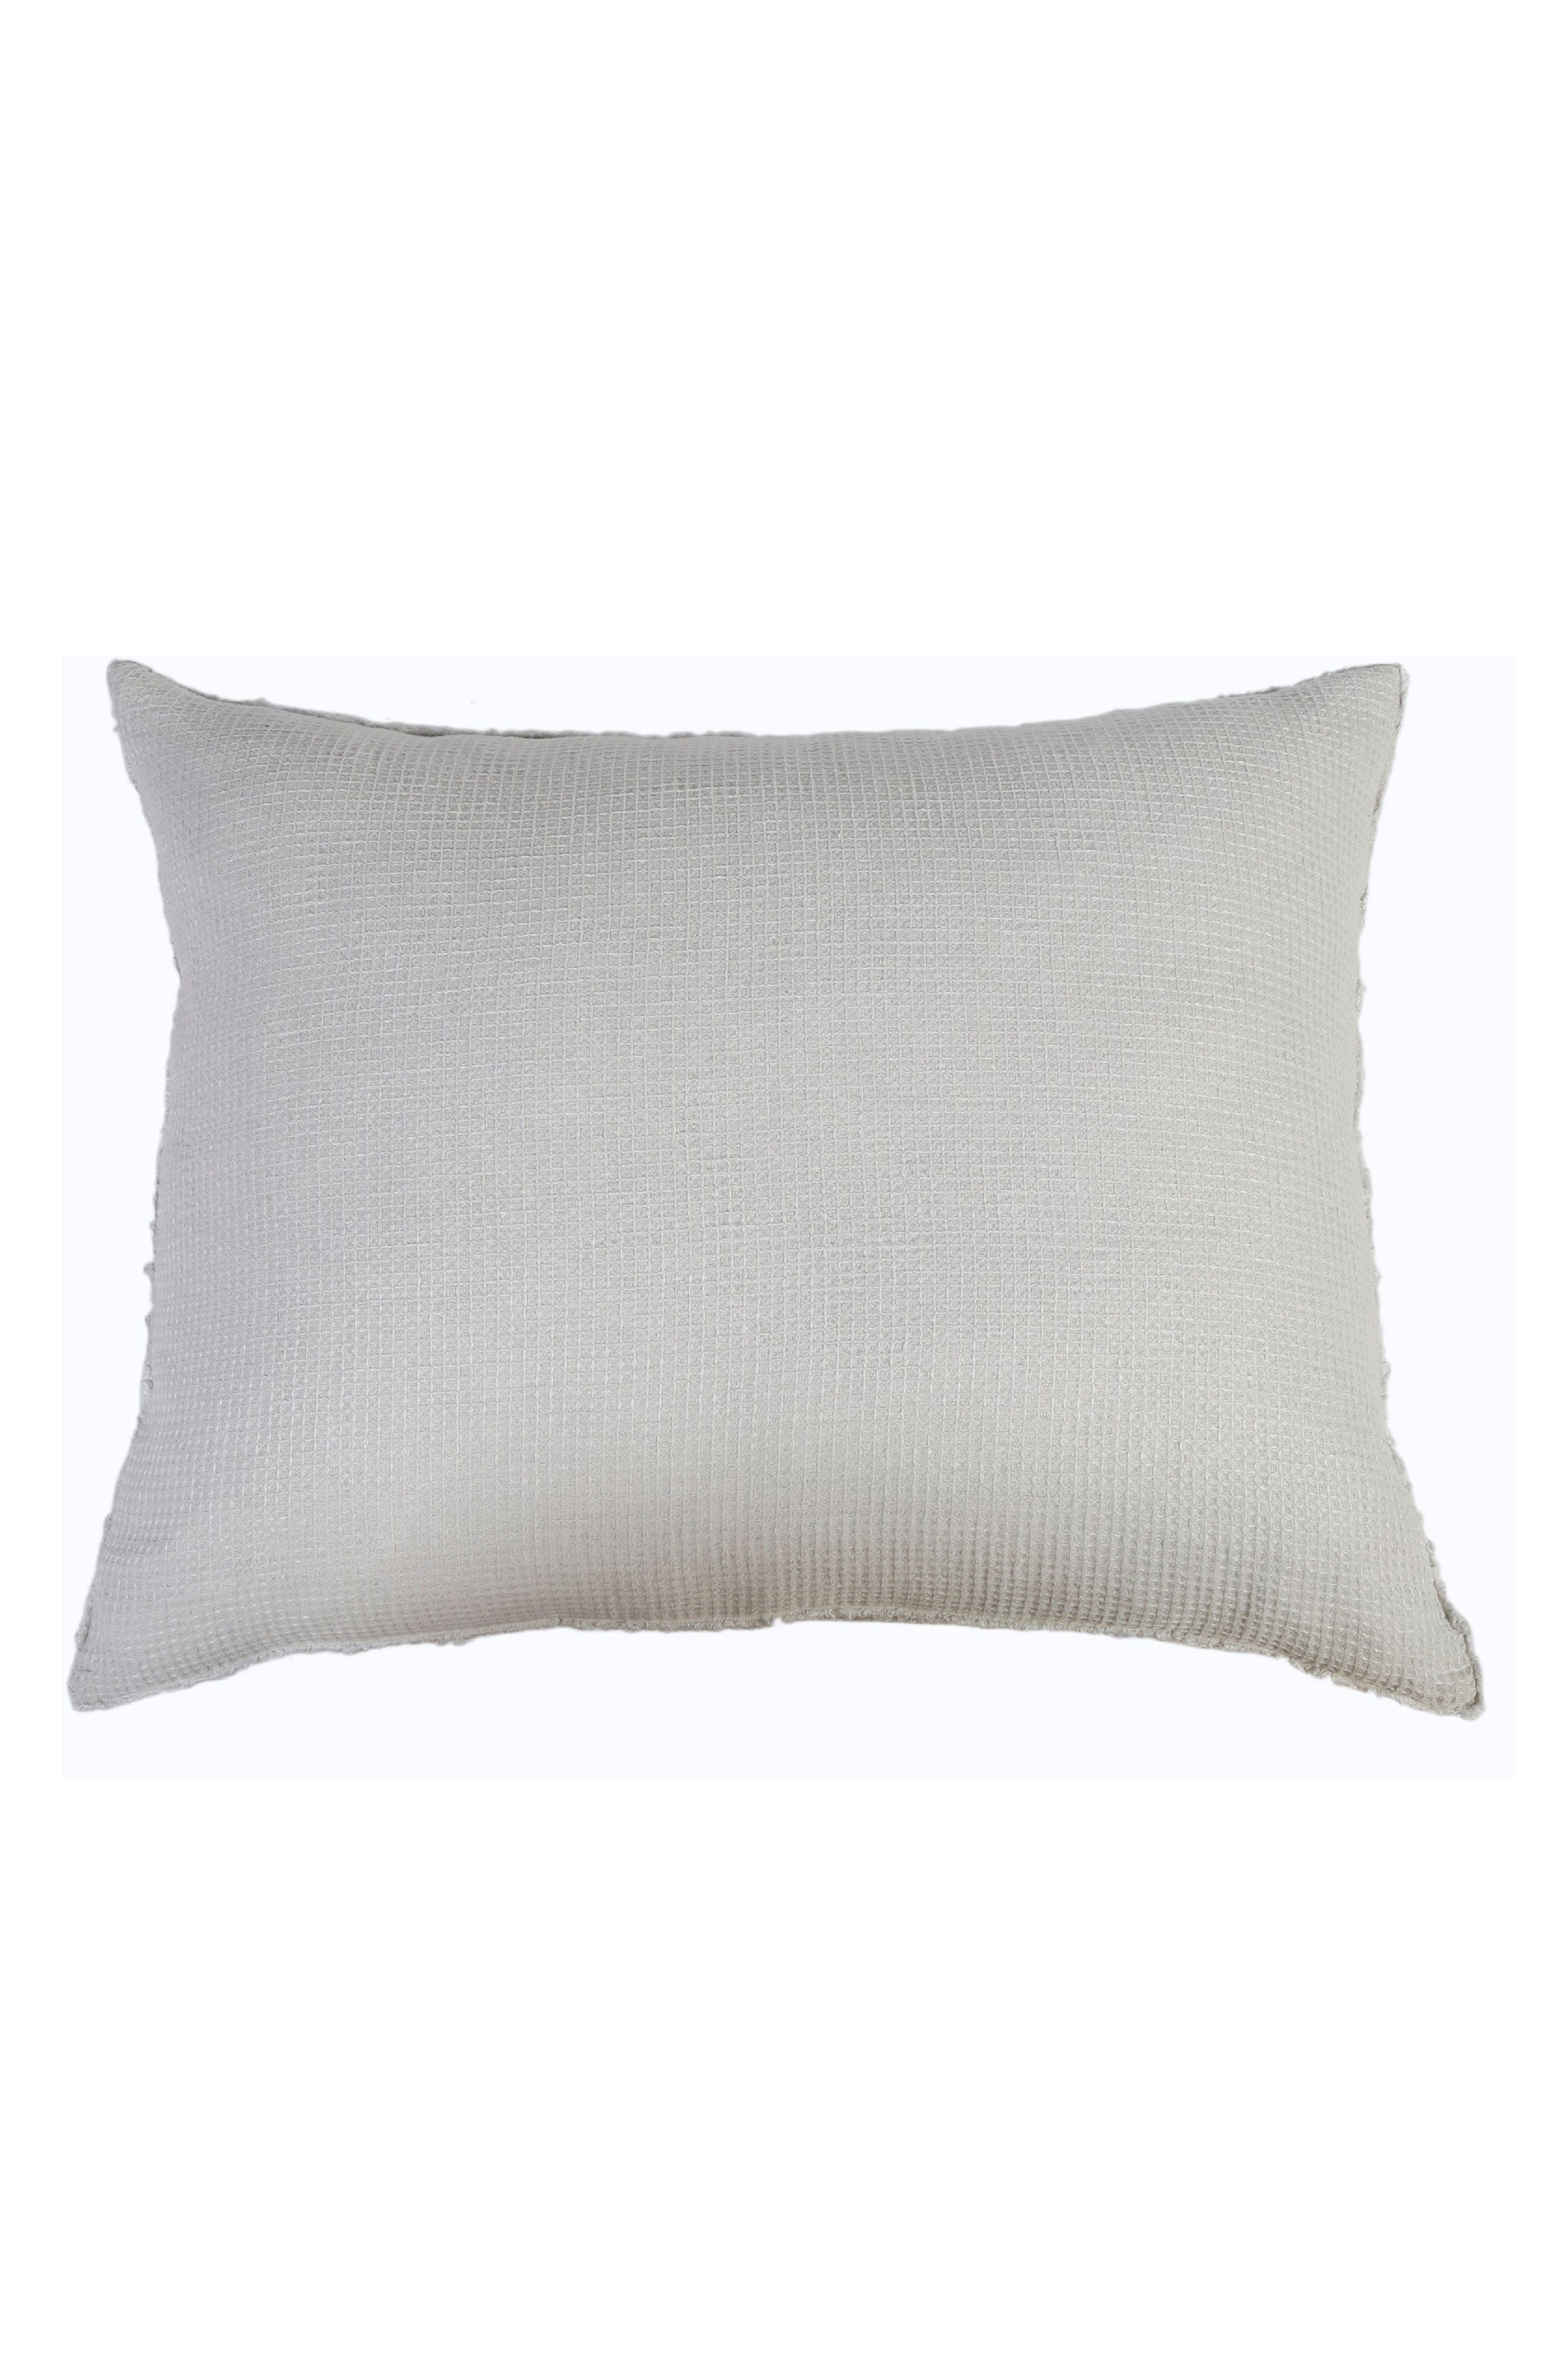 Venice Accent Pillow,                             Main thumbnail 1, color,                             Ocean